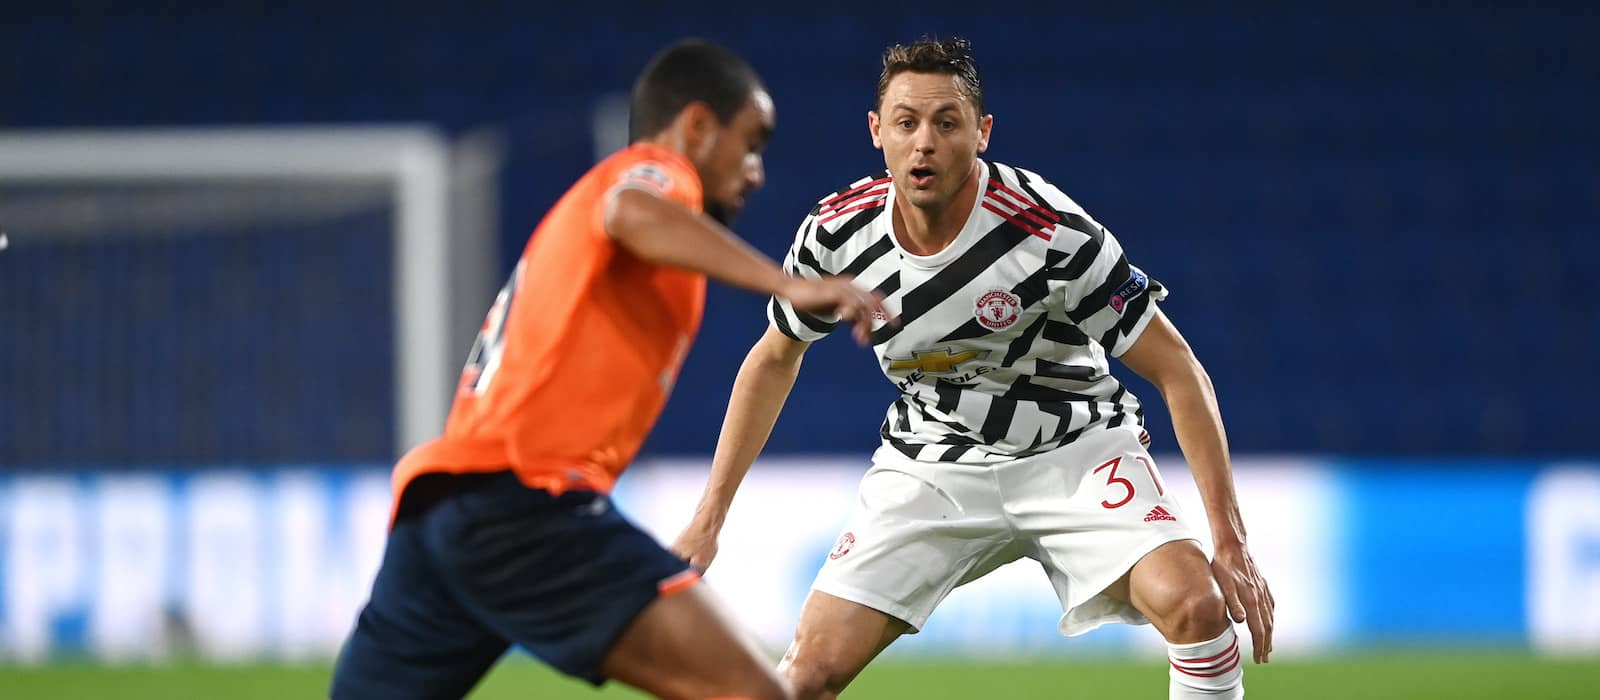 Statistics show Nemanja Matic rolled back the years vs Southampton